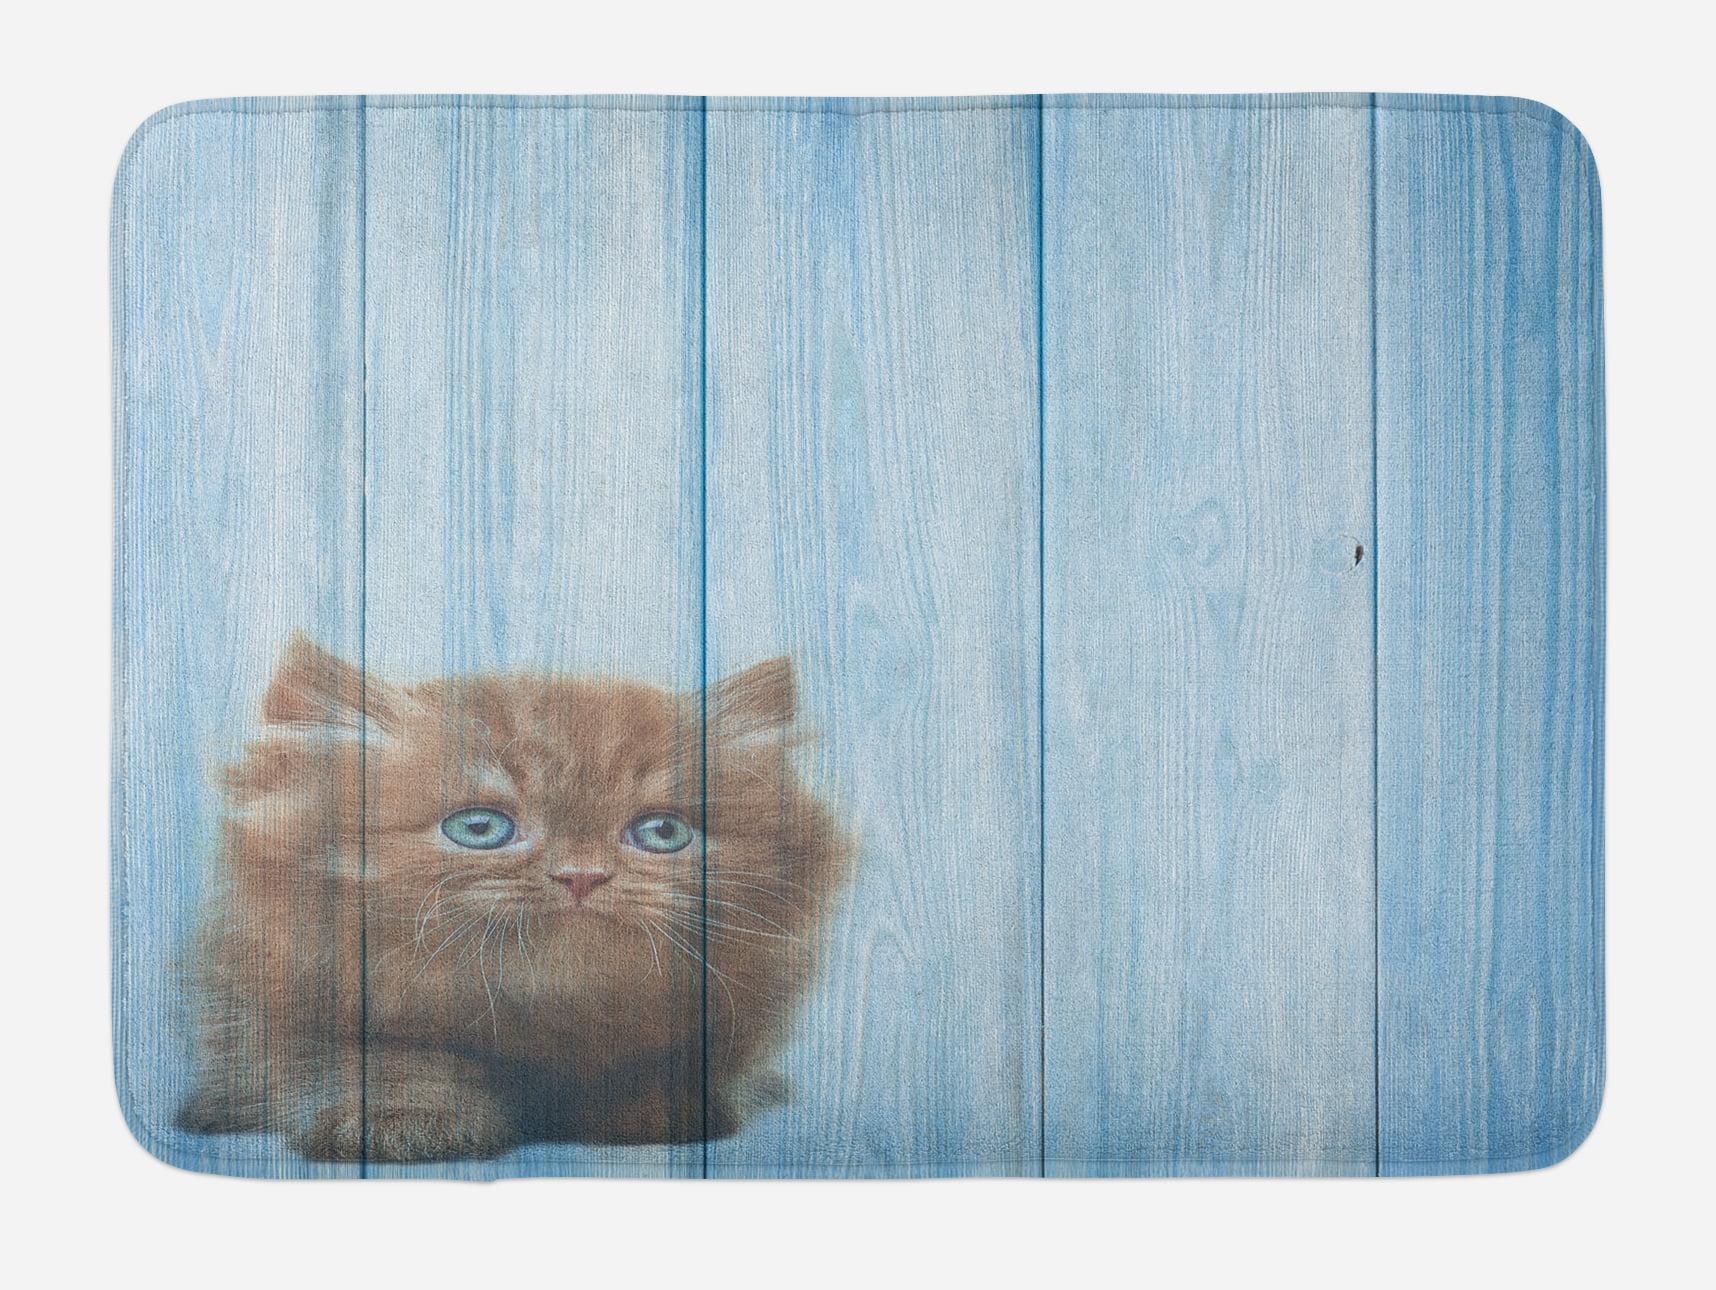 Animal Bath Mat, Cute Kitty Alone on Rustic Vivid Background Kids Childish Artsy Print... by 3decor llc